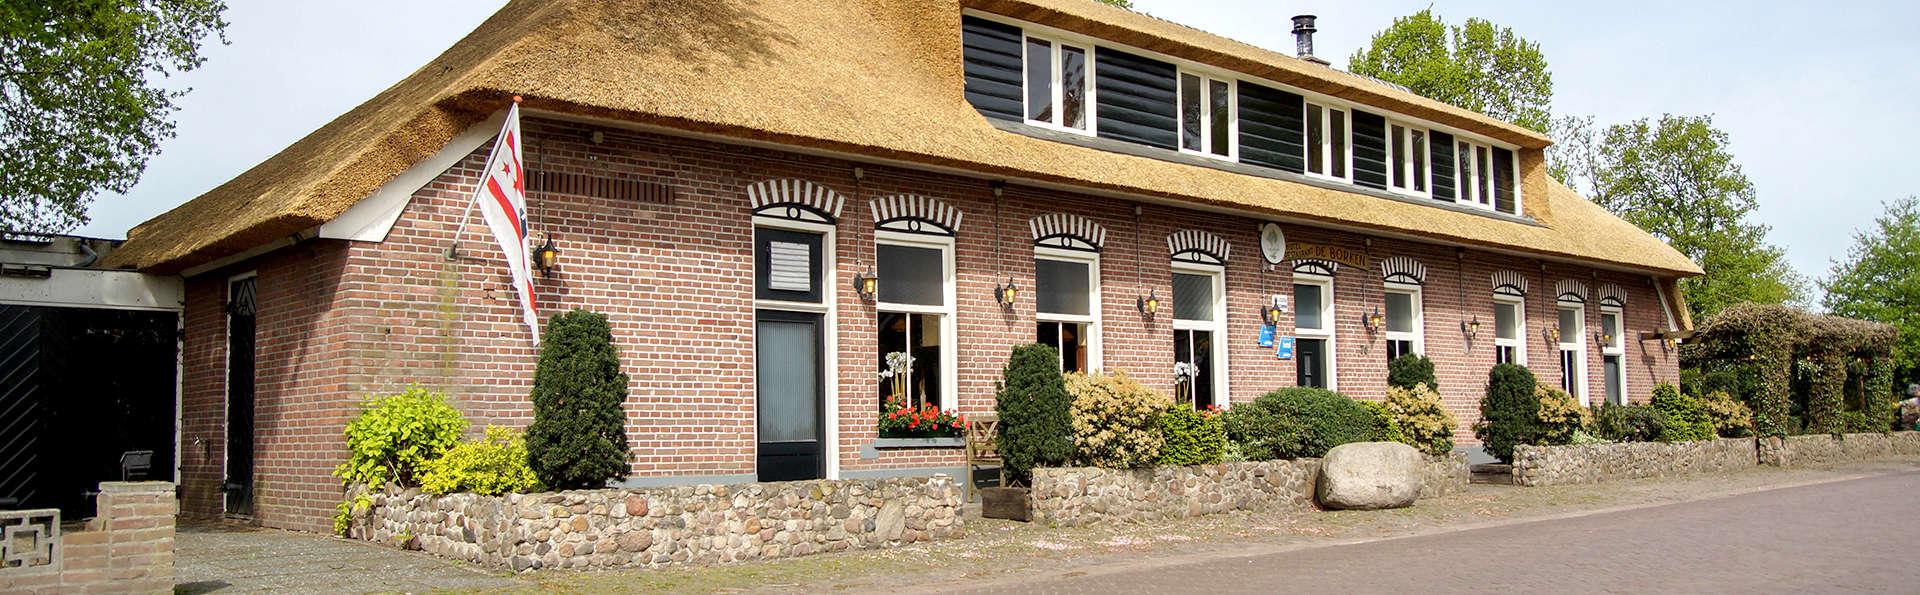 Fletcher Landhotel De Borken - Edit_Front2.jpg